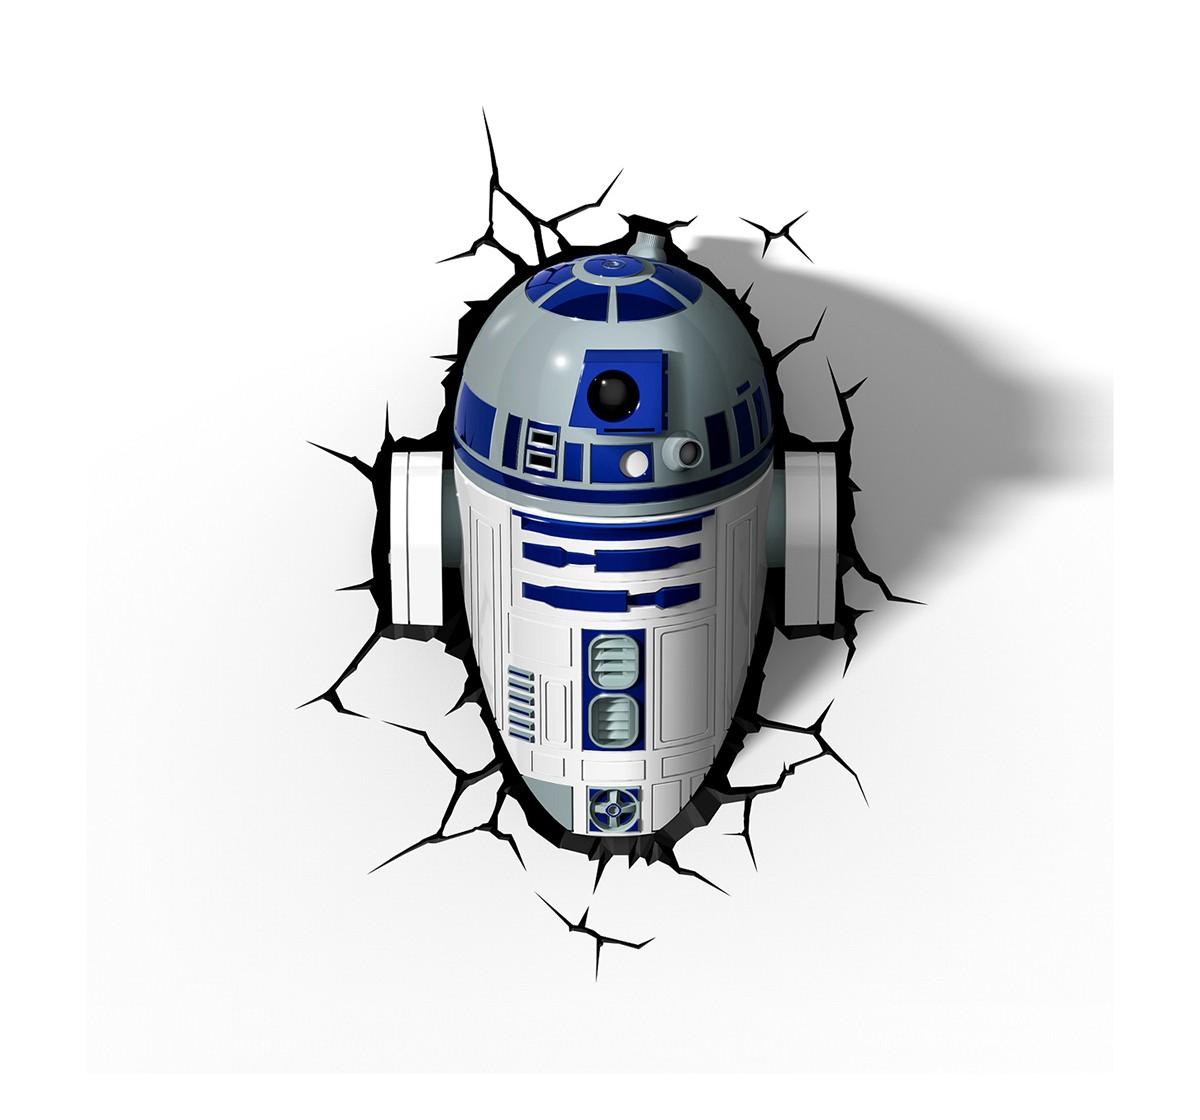 Star Wars Star Wars R2-D2 3D Deco Light for Boys age 5Y+